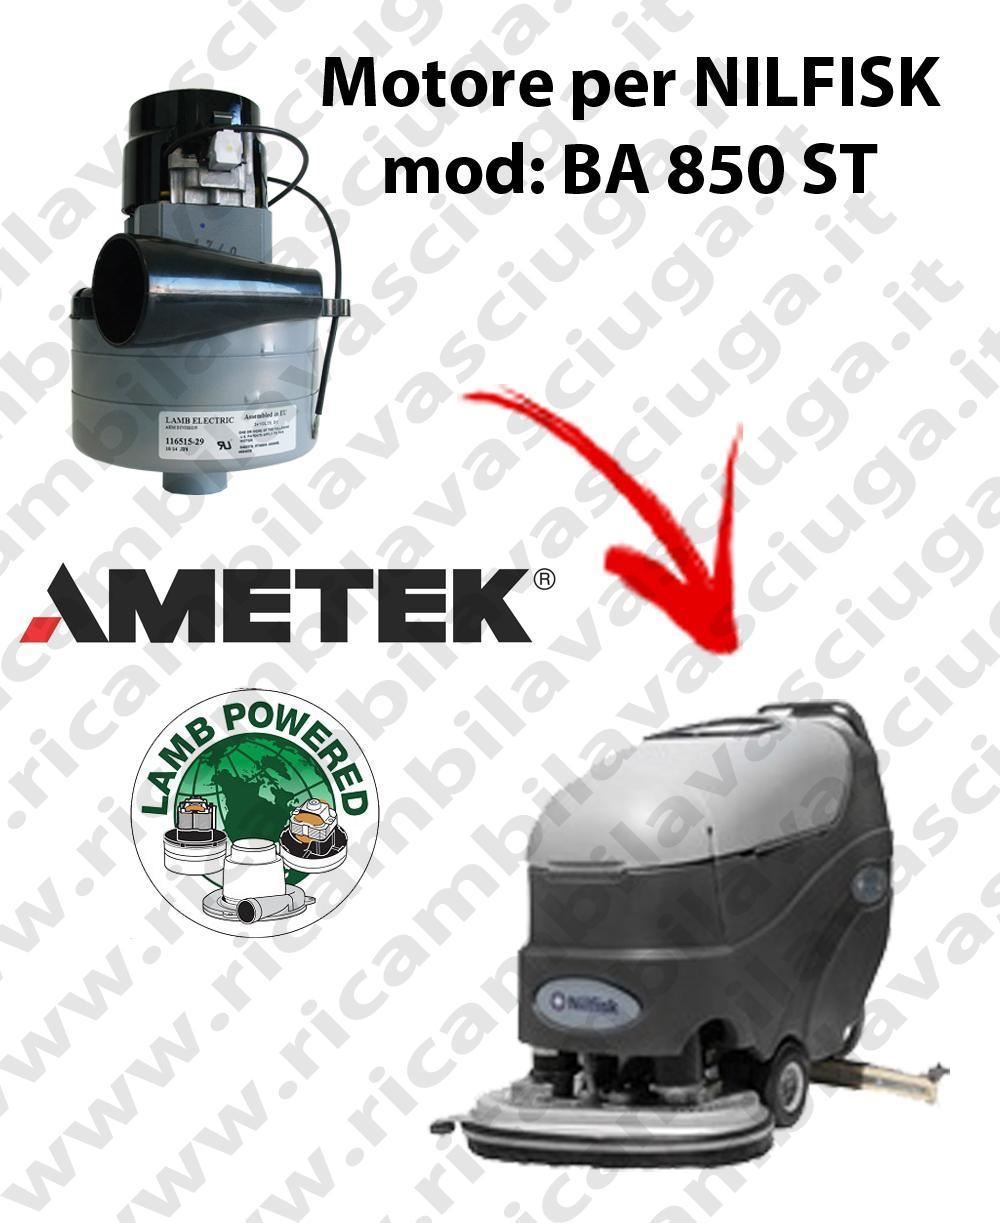 BA 850 ST Saugmotor LAMB AMETEK für scheuersaugmaschinen NILFISK